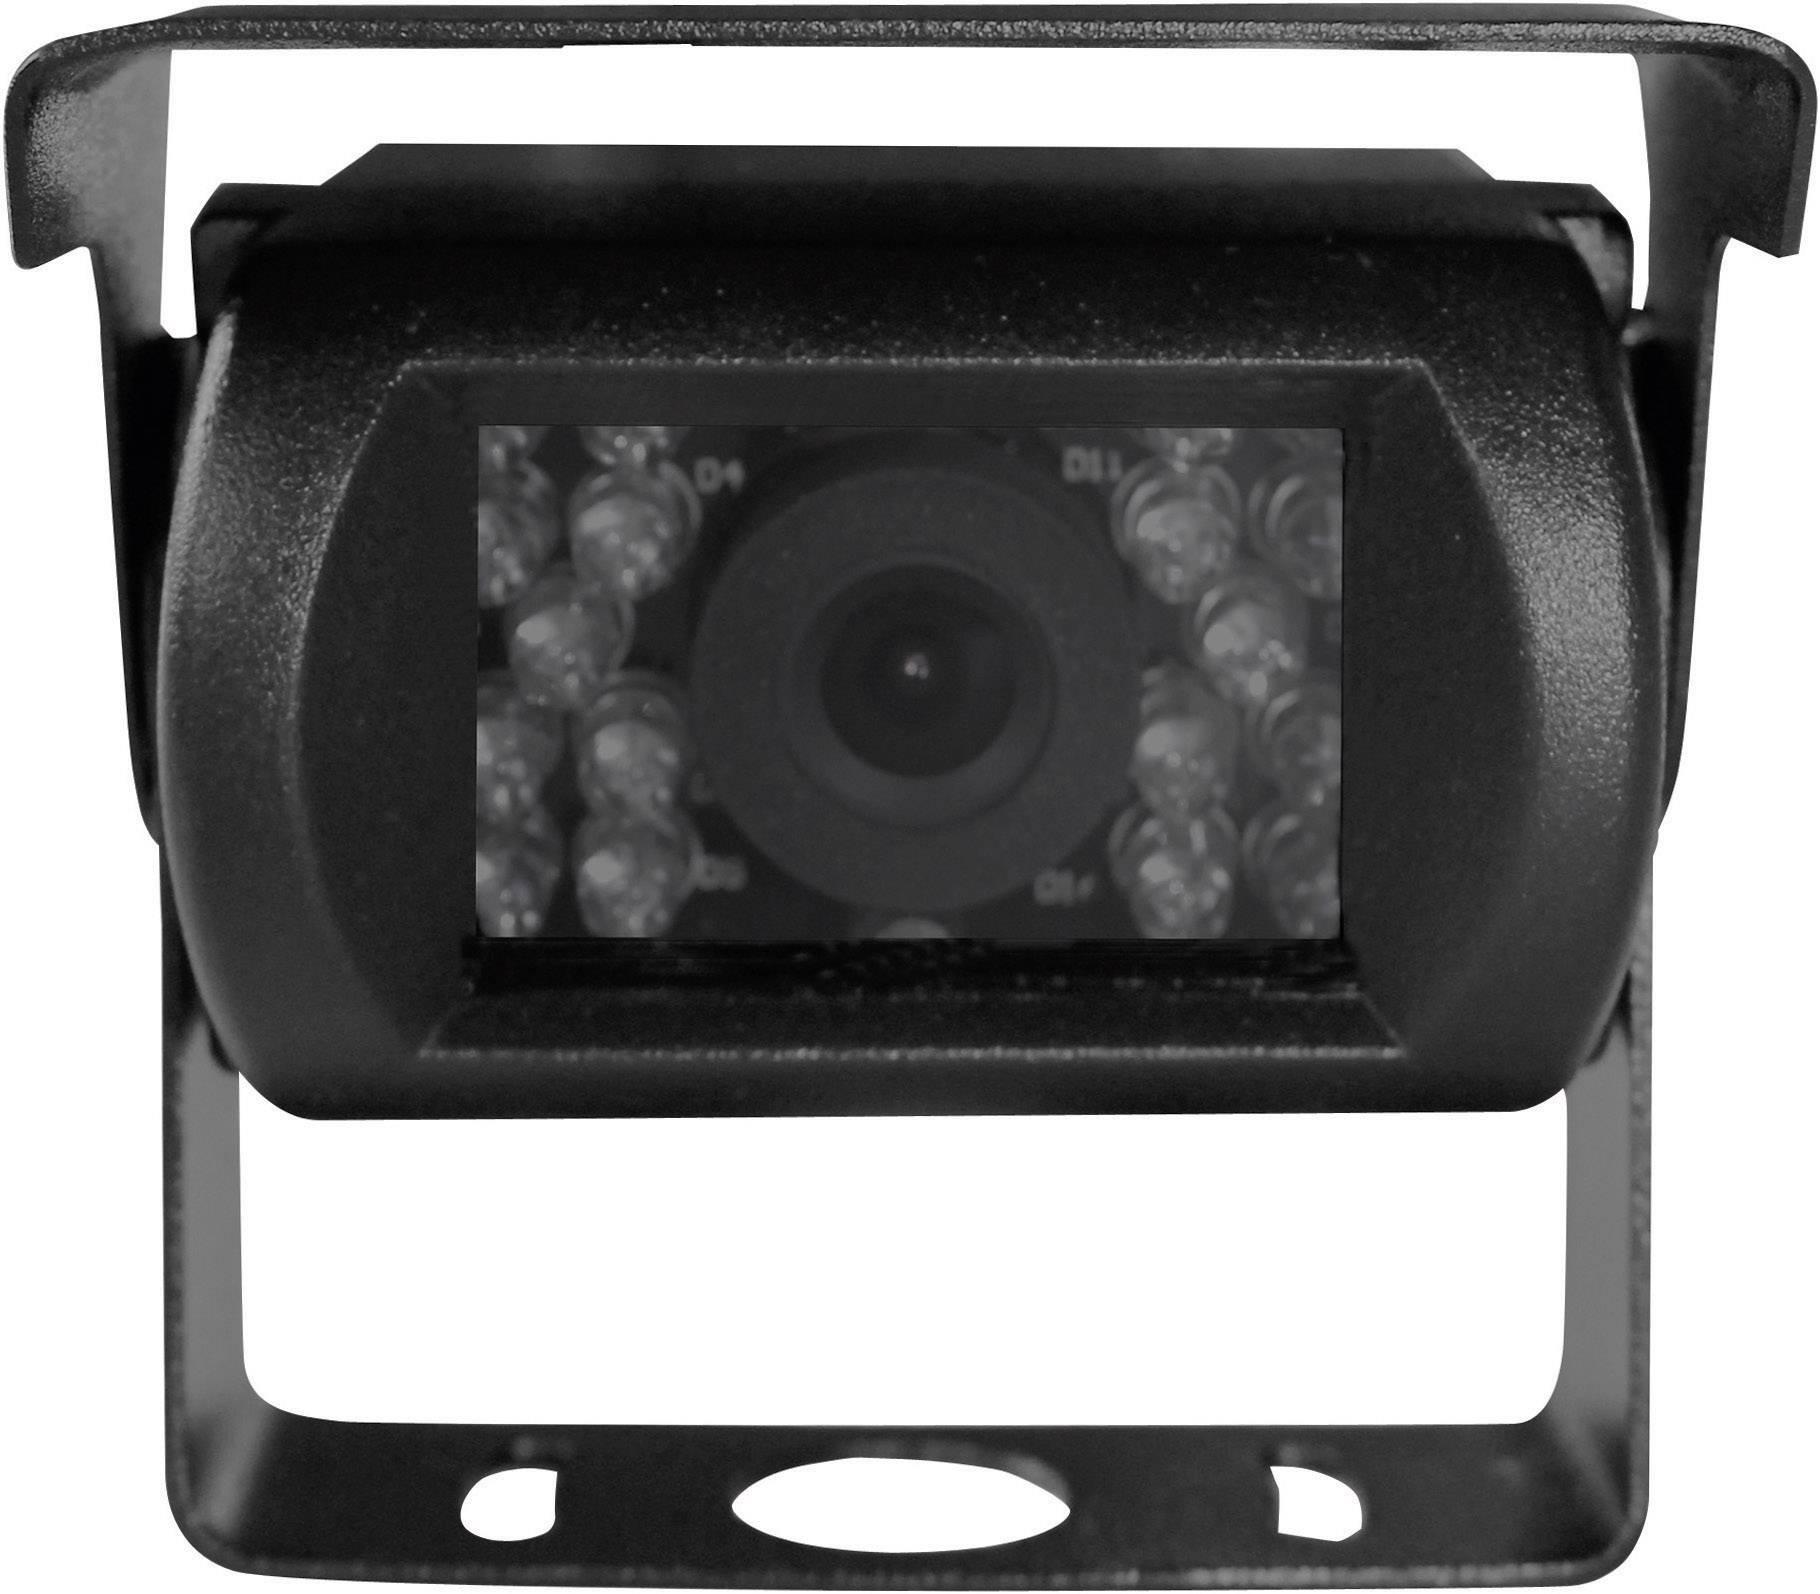 Kabelgebonden achteruitrijcamera Beeper RWEC99X/CAM Extra IR ...